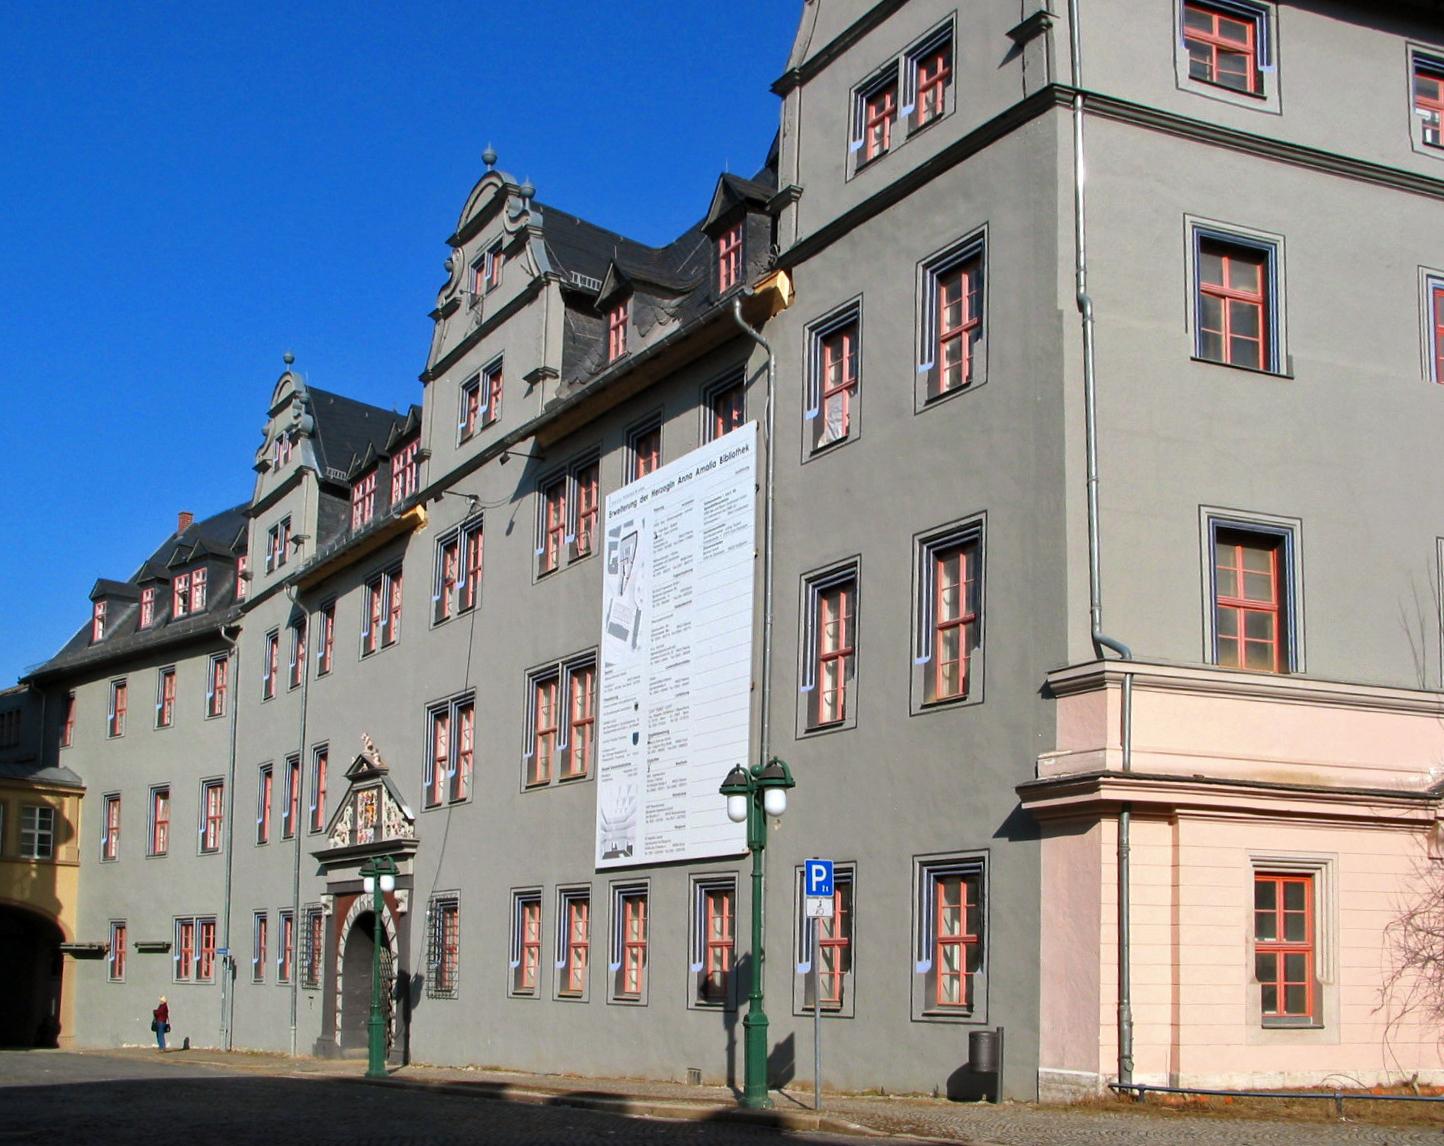 Dorothea Susanne of Simmern